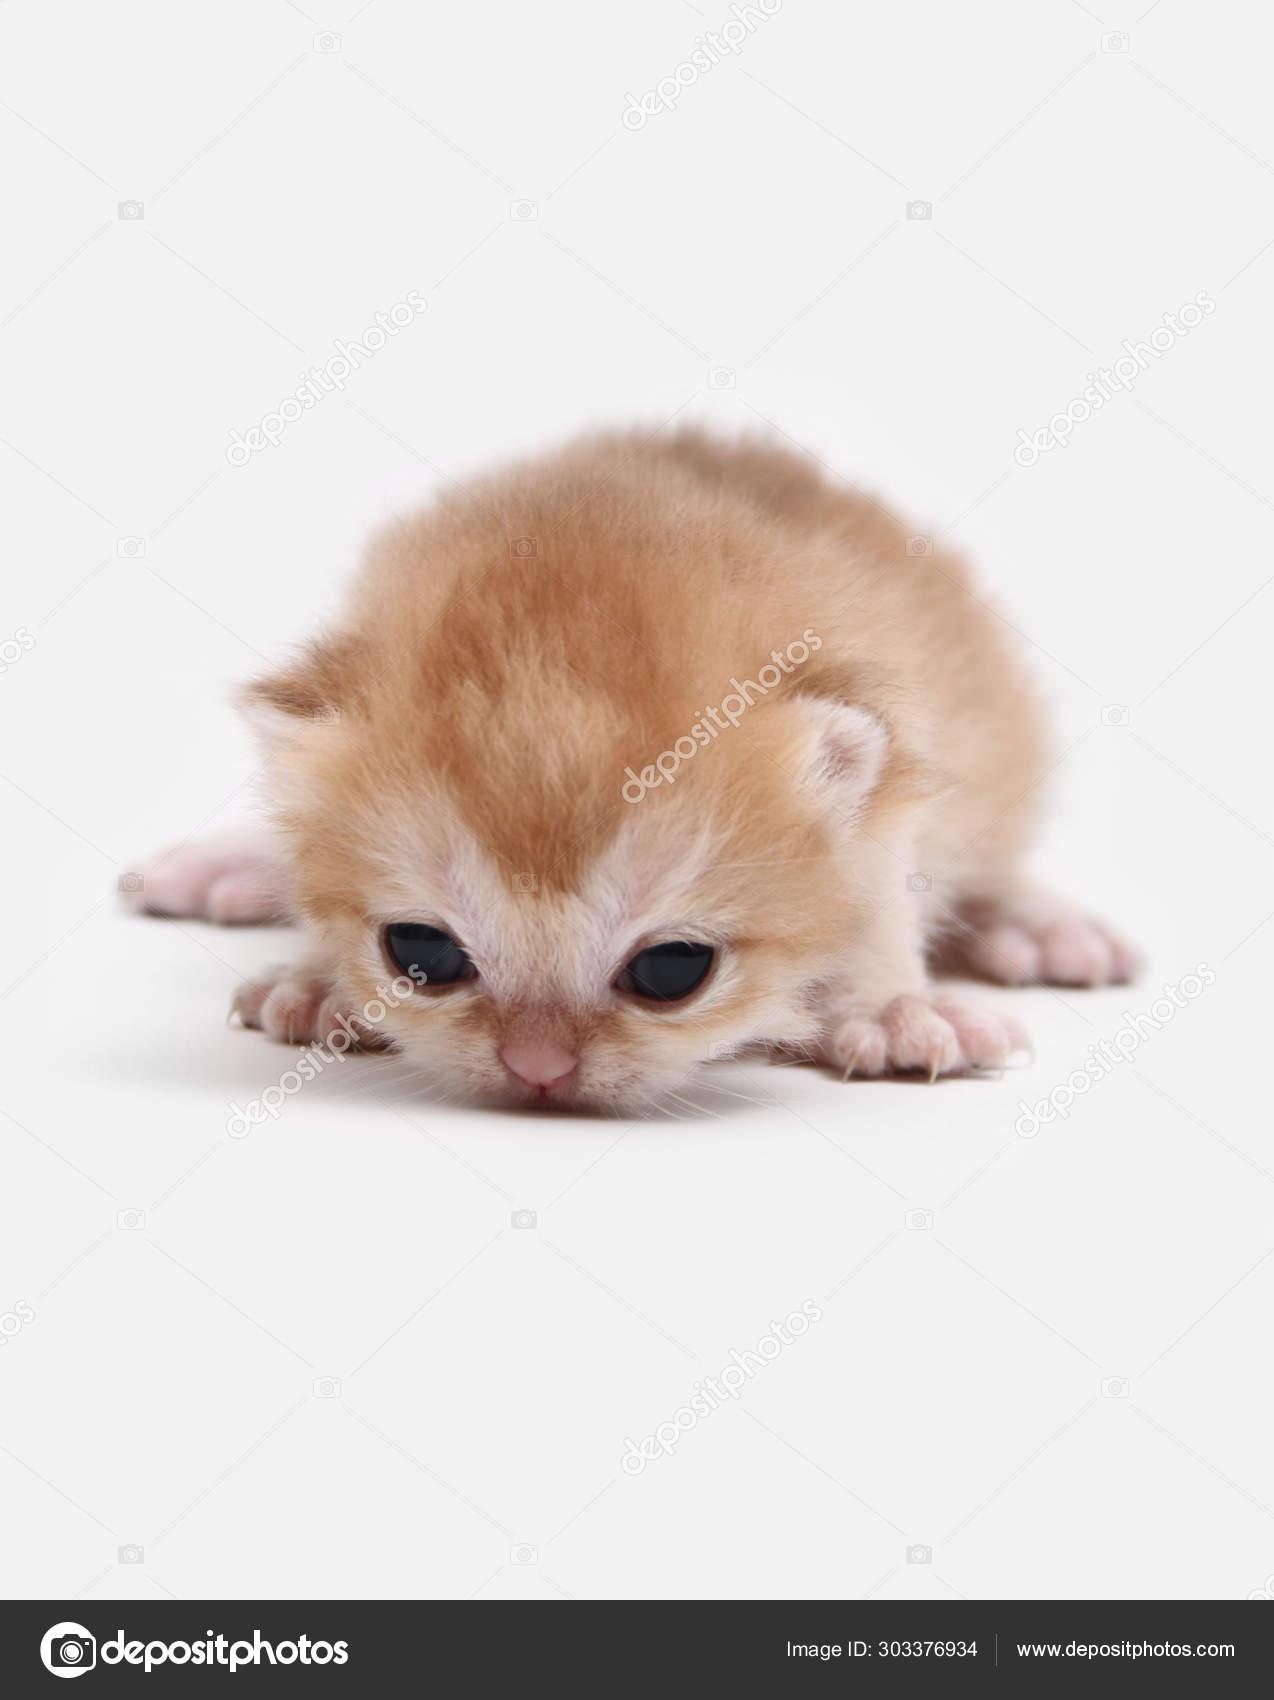 British Shorthair Bri Black Golden Shaded Kitten White Background Stock Photo C Mirencats 303376934